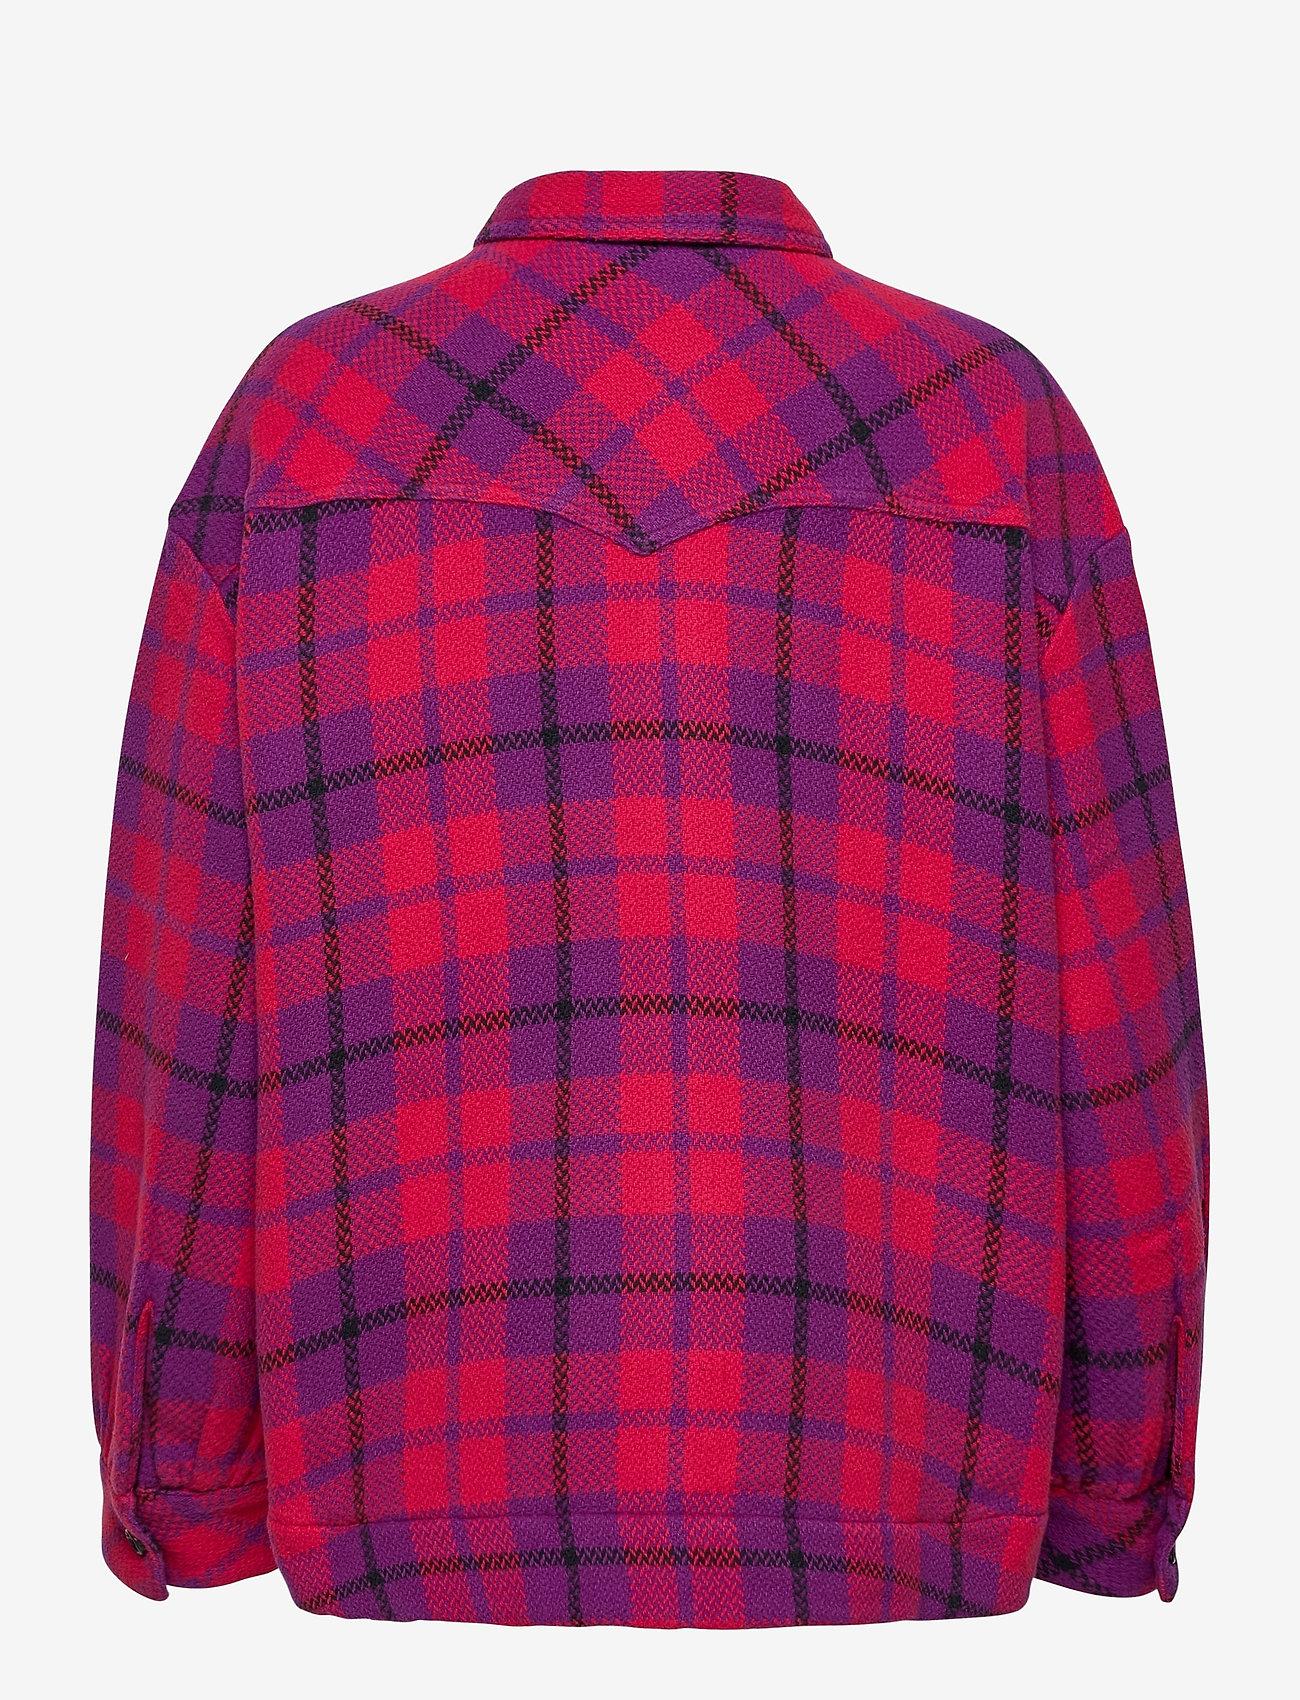 Wrangler - WESTERN SHIRT JACKET - overshirts - ultraviolet - 1